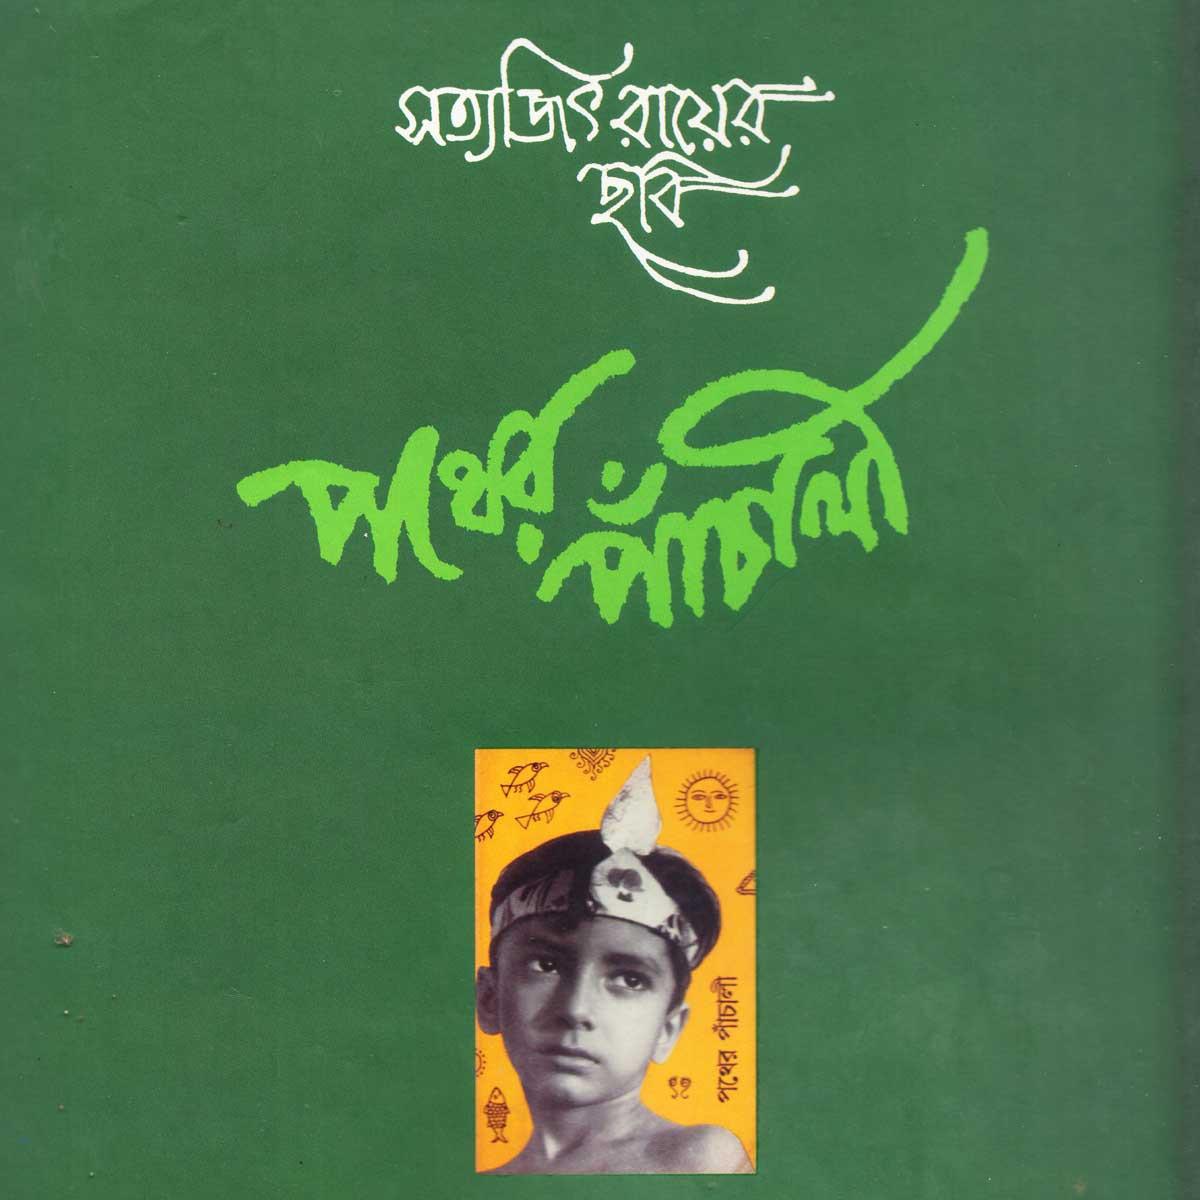 Pother Panchali/পথের পাঁচালী